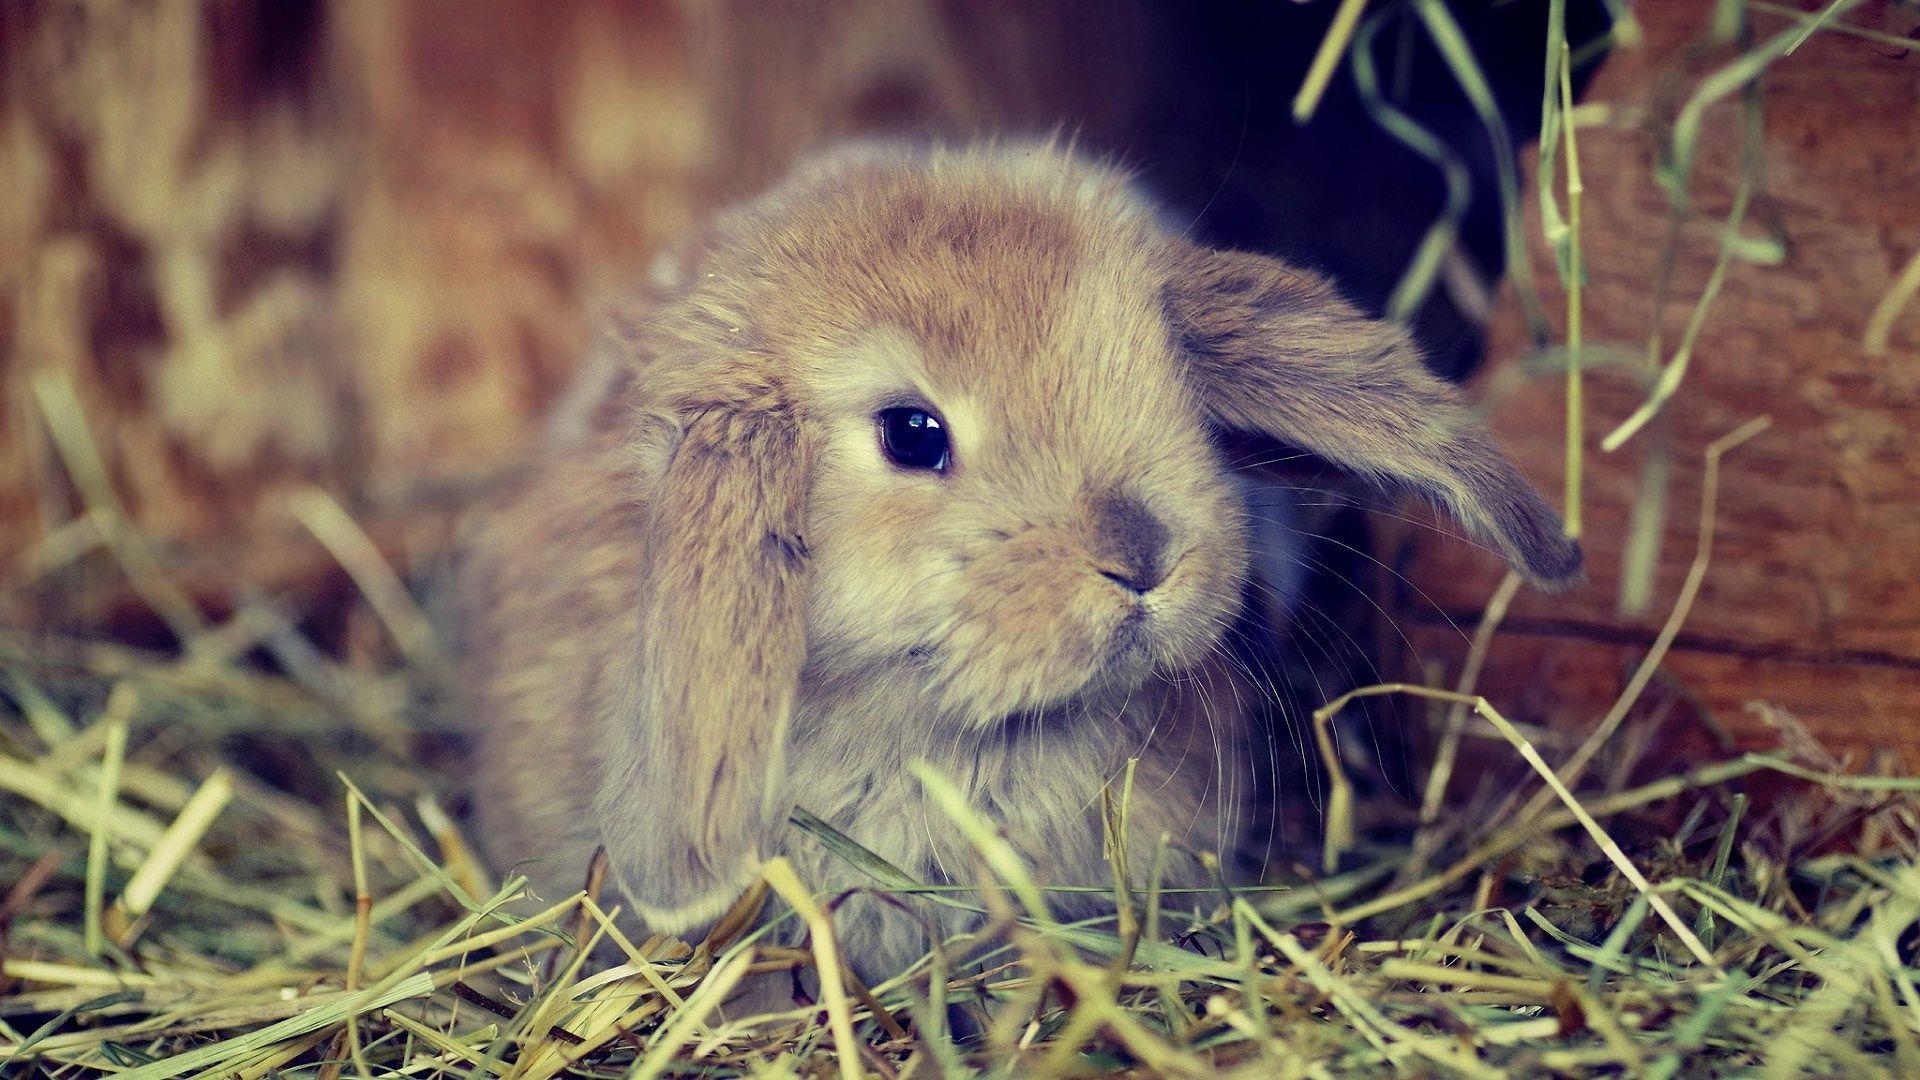 1920x1080 Cute Fluffy Bunny Wallpaper Bunny Wallpaper Animals